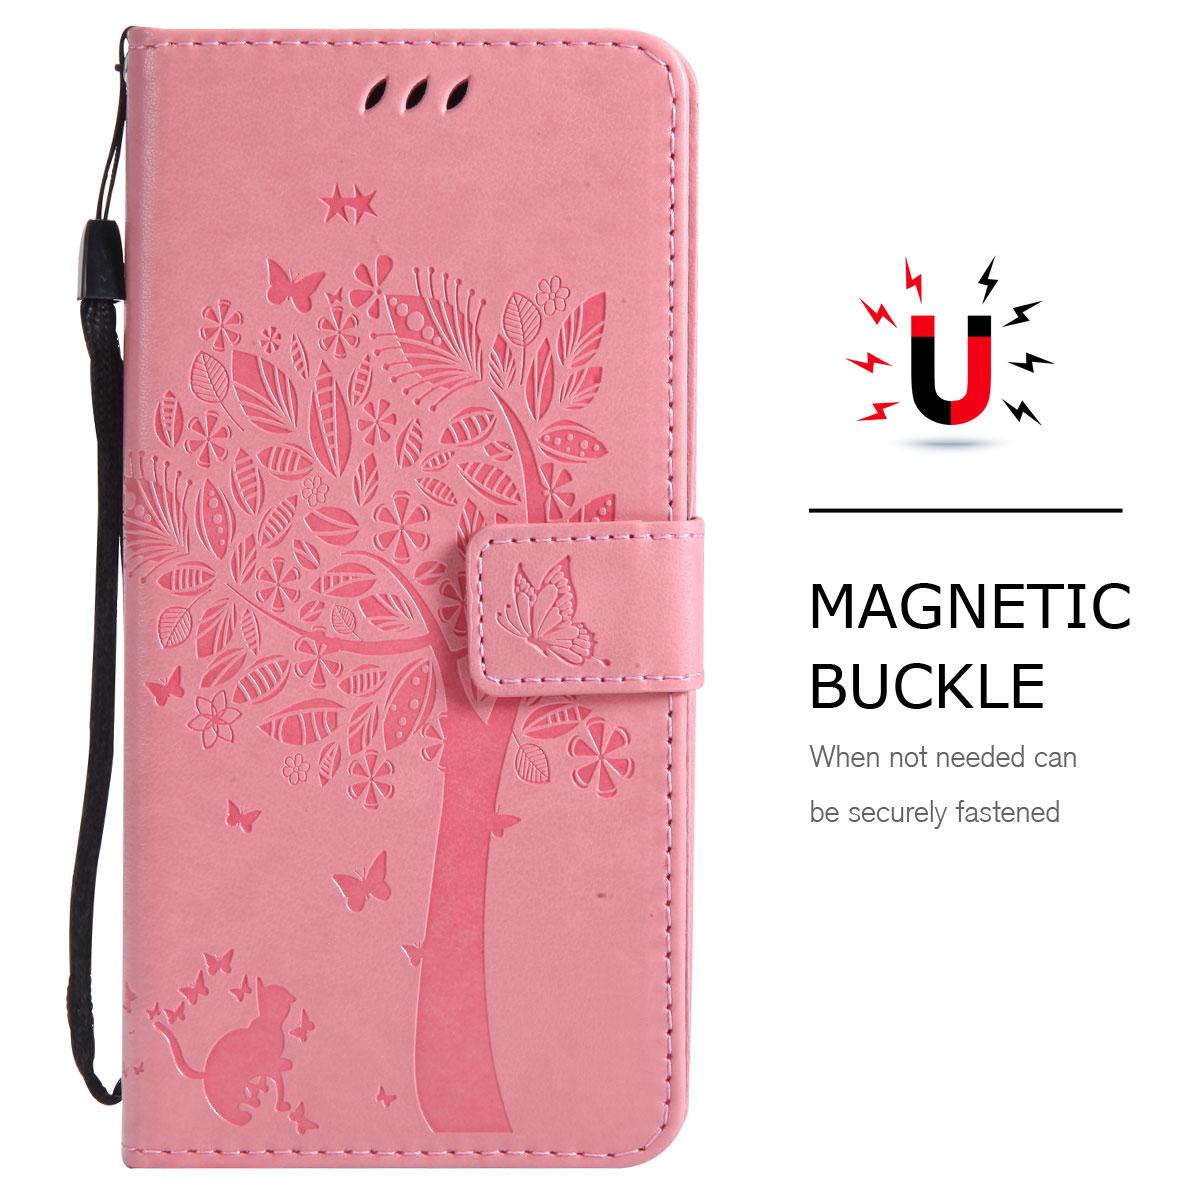 Magnetic-Leather-Credit-Card-Holder-Flip-Case-Cover-For-Google-Pixel-2-2-XL thumbnail 16